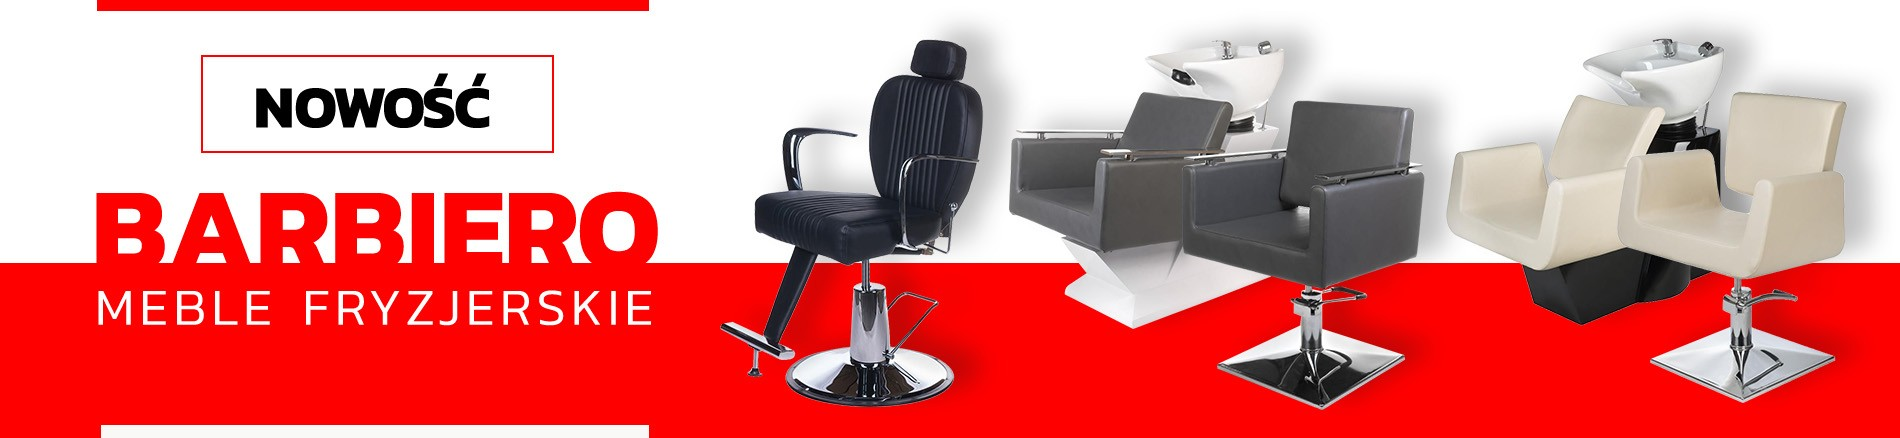 Barbiero - meble fryzjerskie